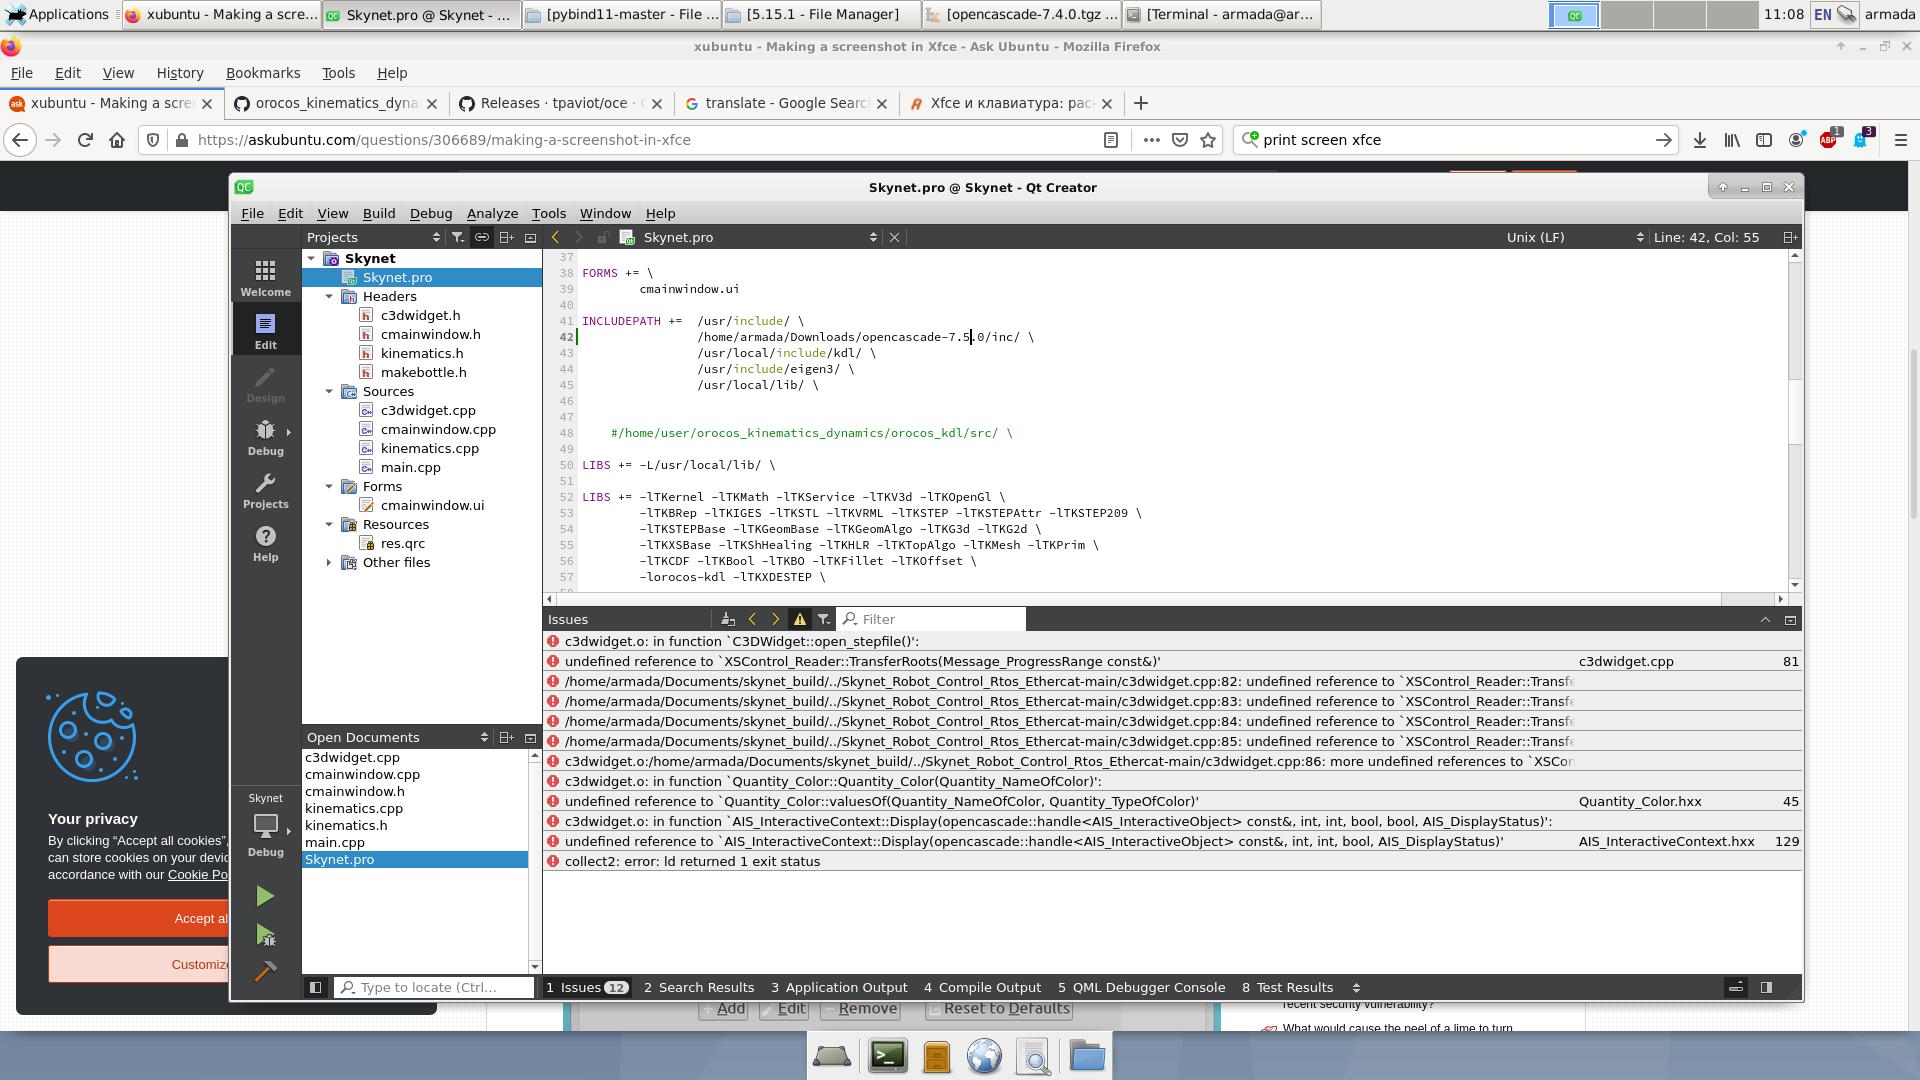 Screenshot_2021-03-11_11-08-39_2021-03-11.png